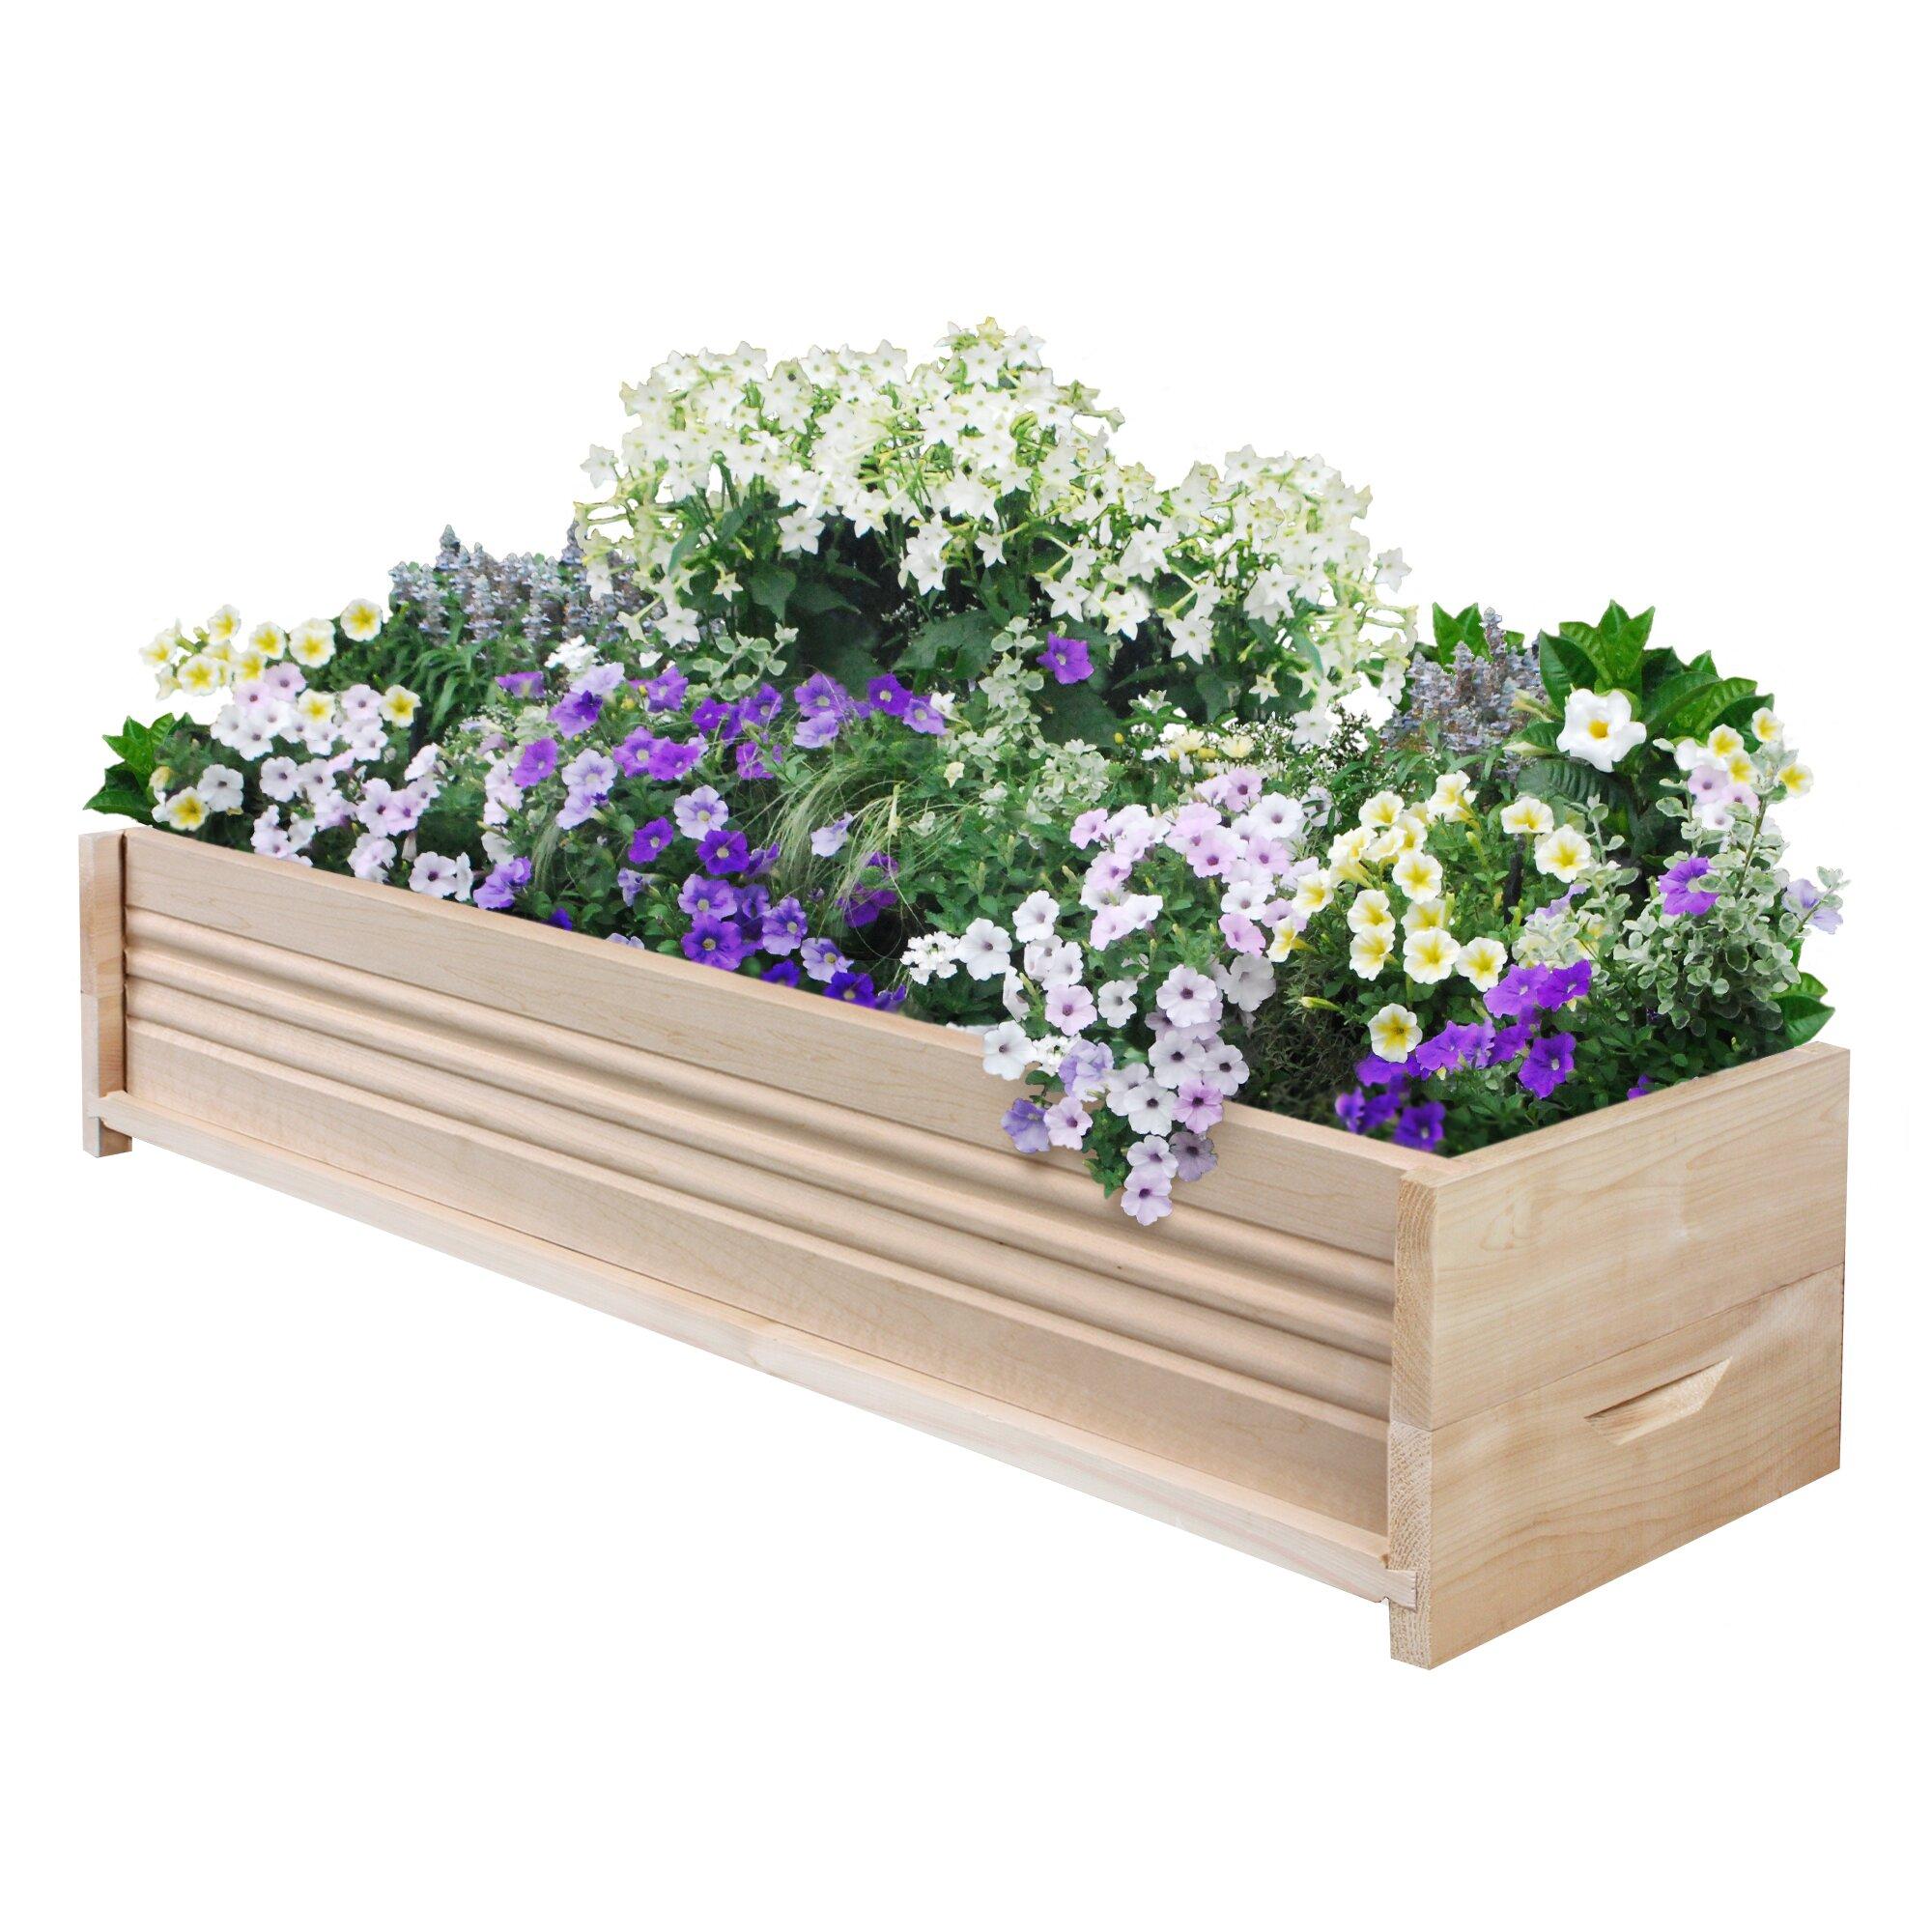 Planter Fence: Greenes Fence Rectangular Planter Box